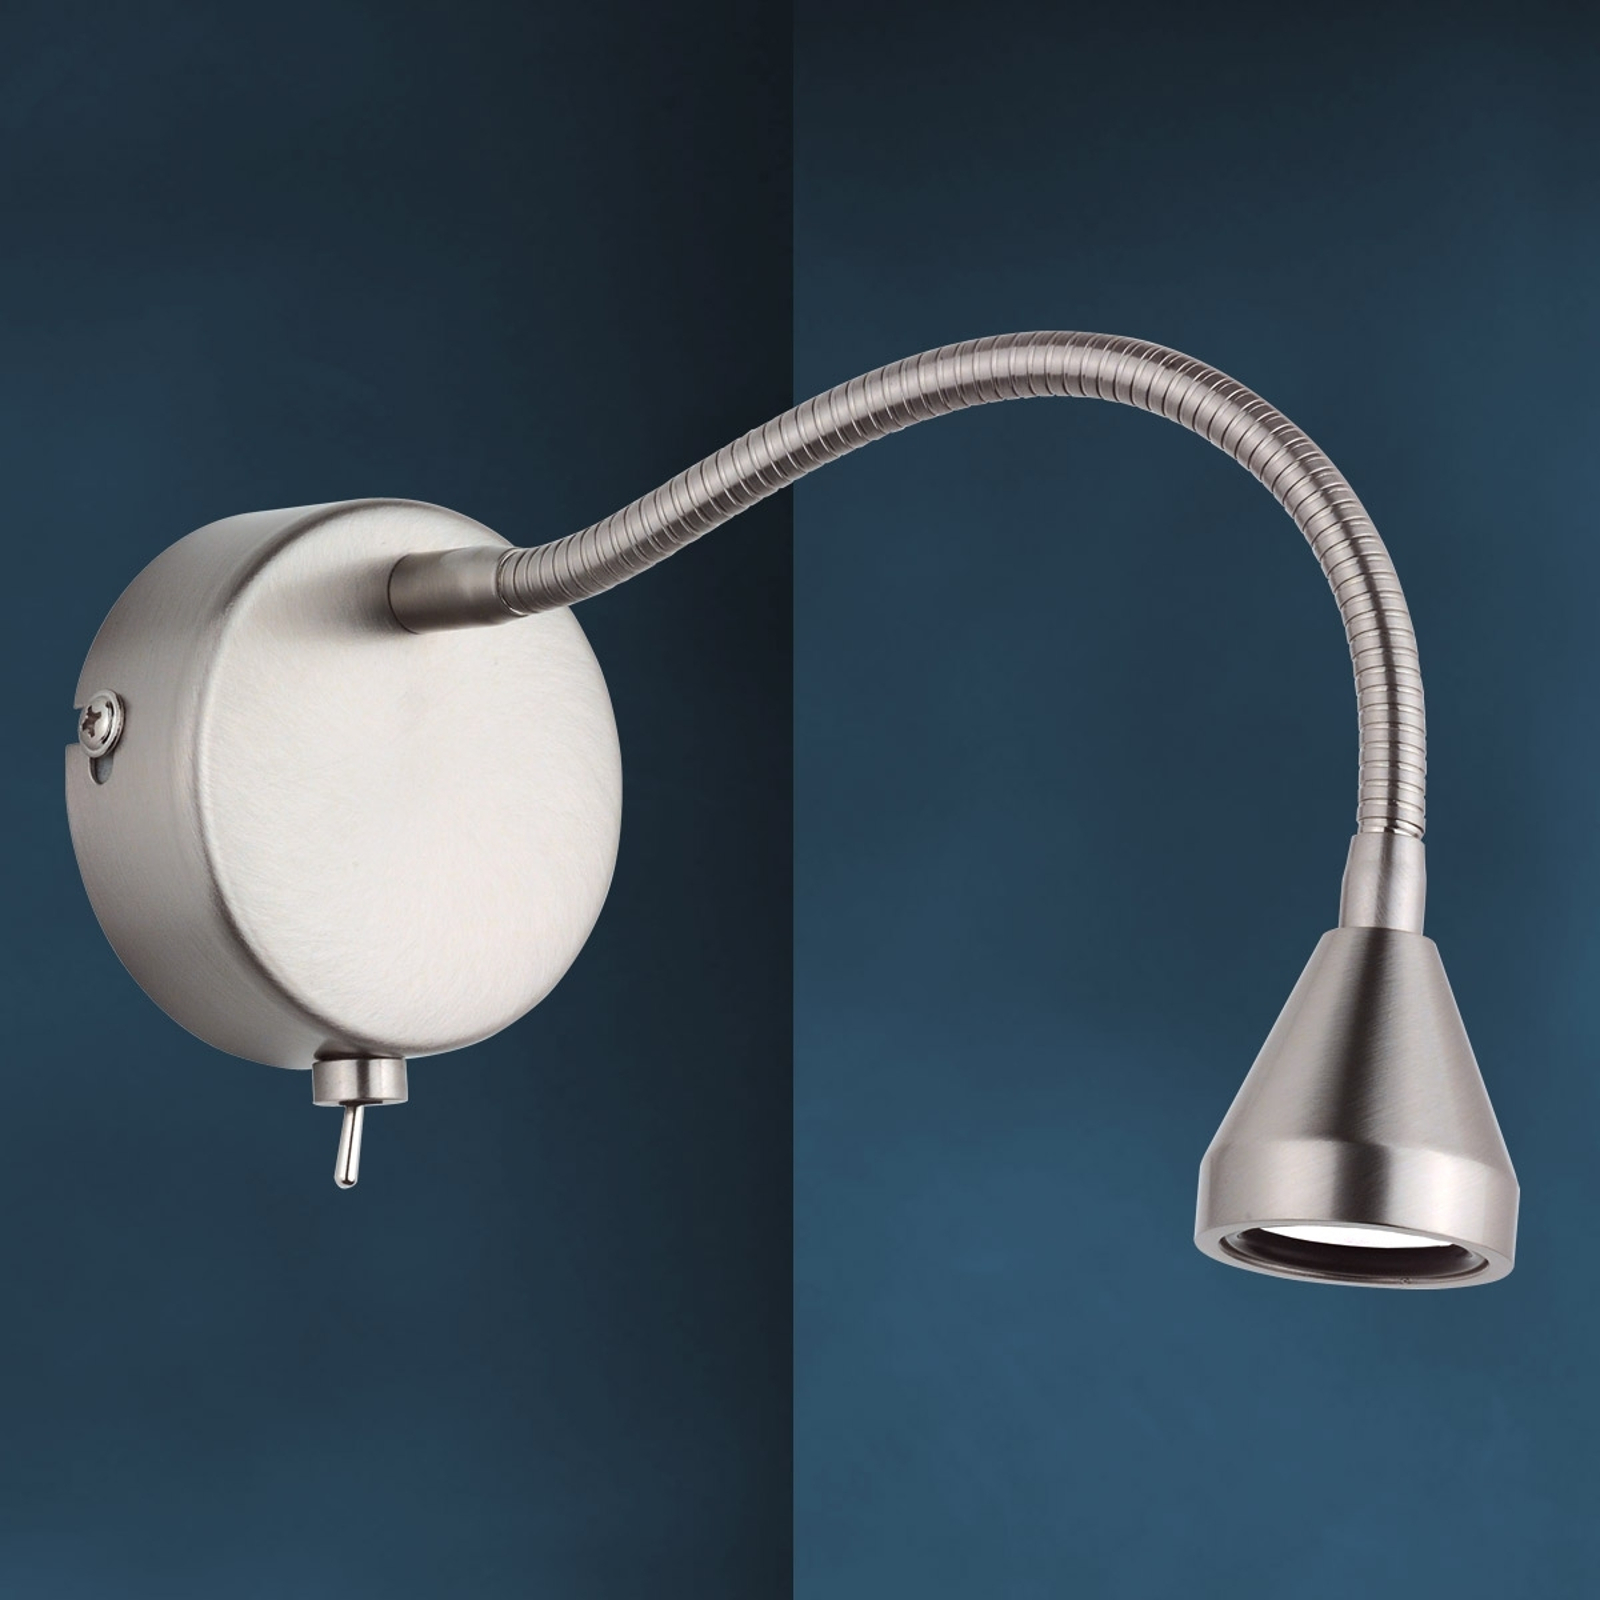 LED wall light MINI, flexible arm_1524035_1